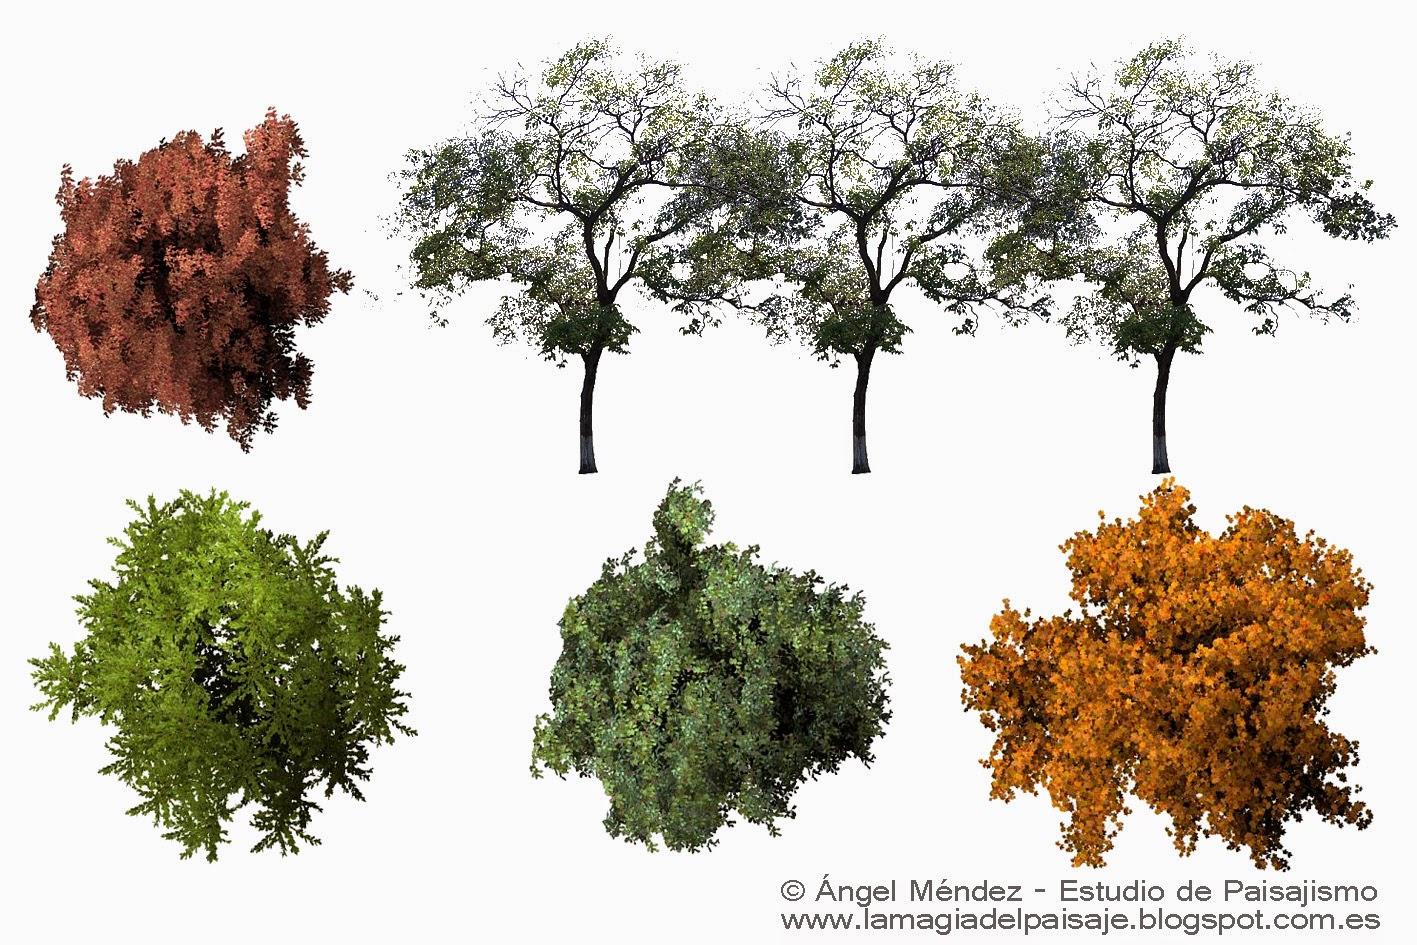 Diámetros de las plantas